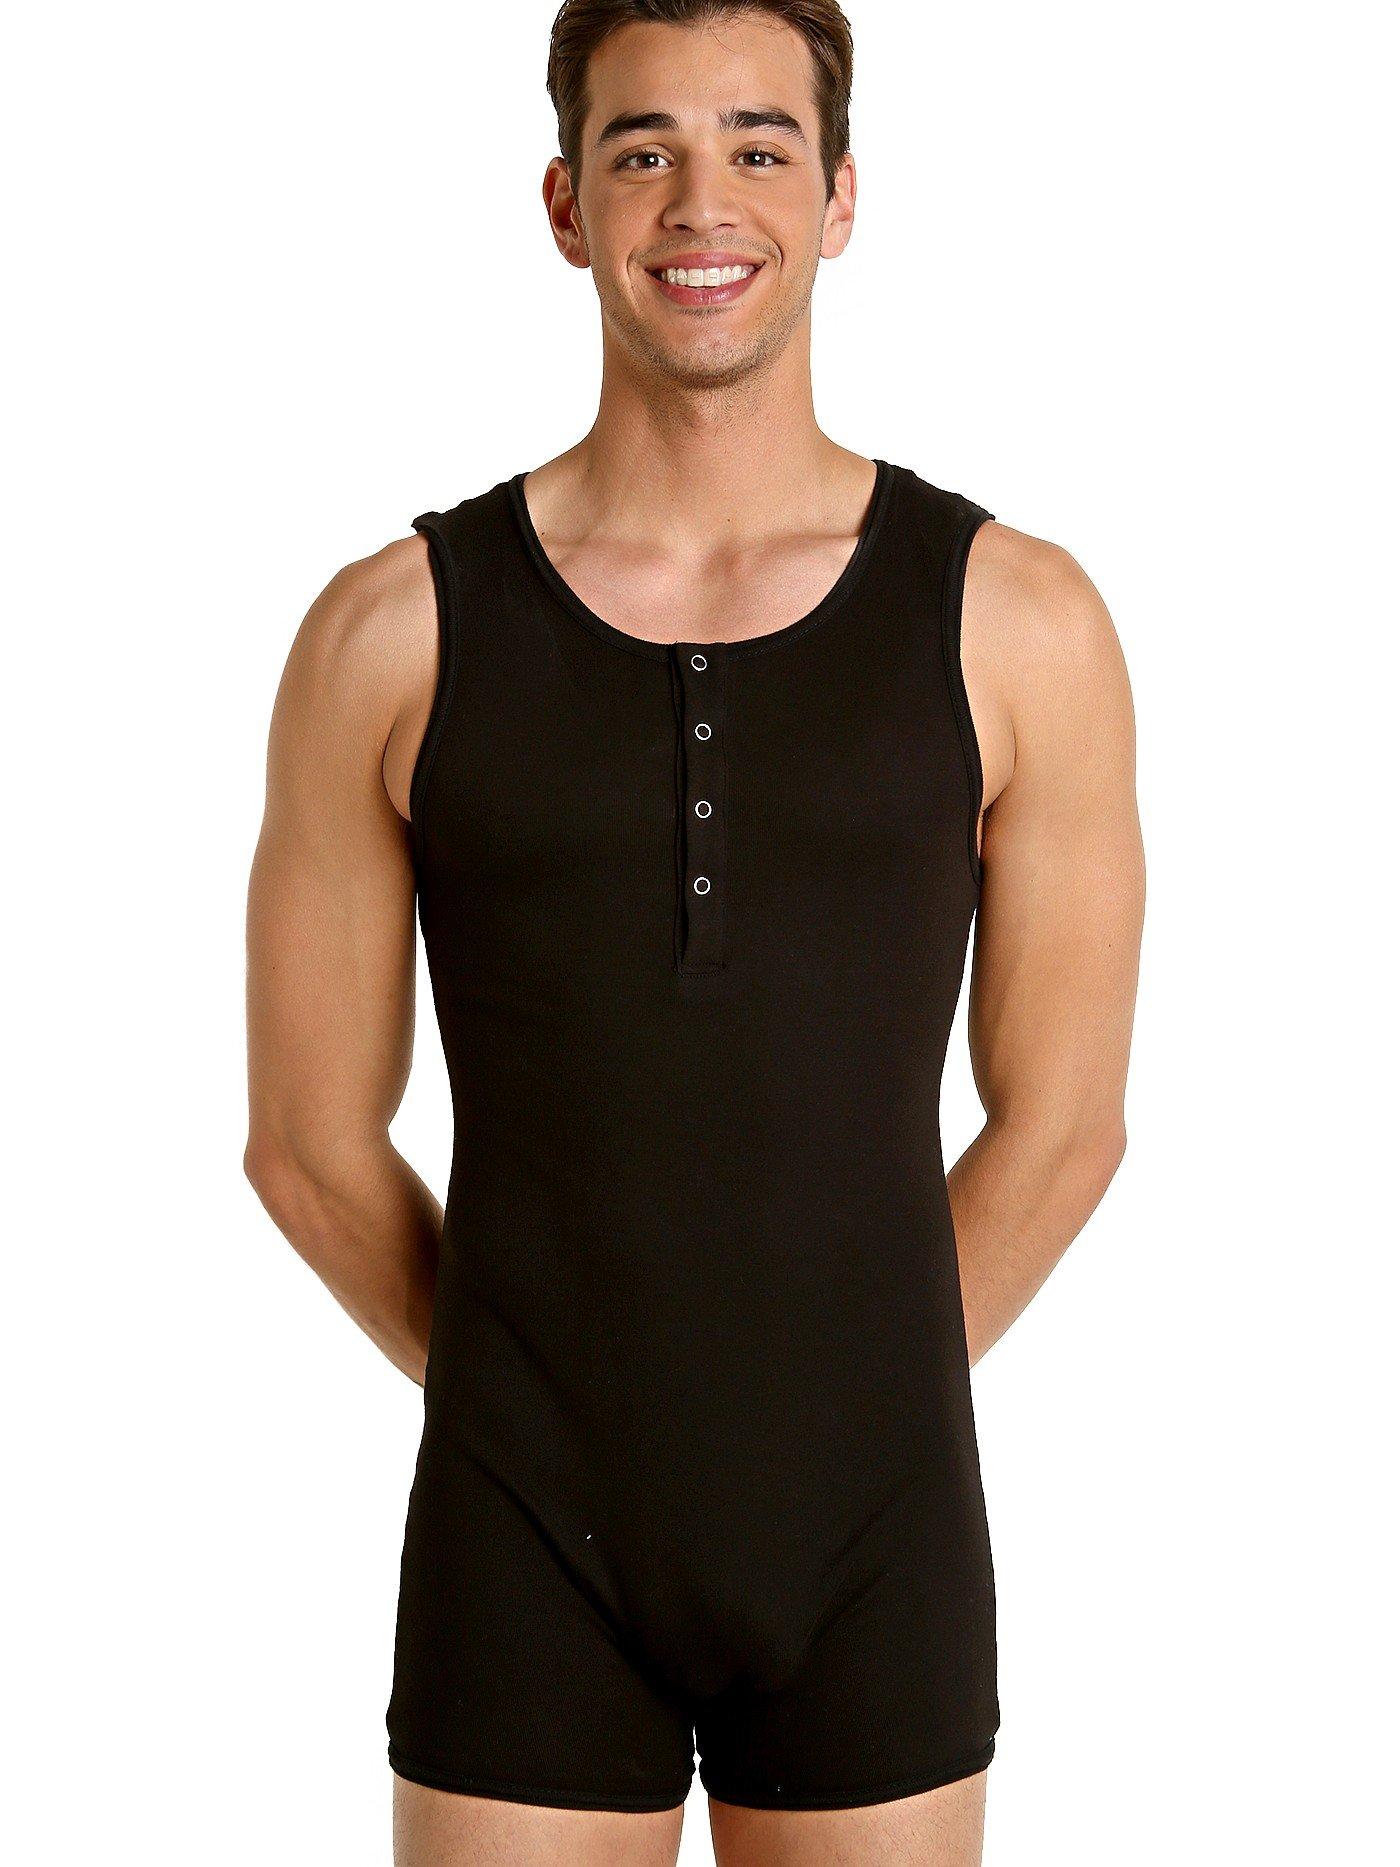 Go Softwear California Guy Onesie Black